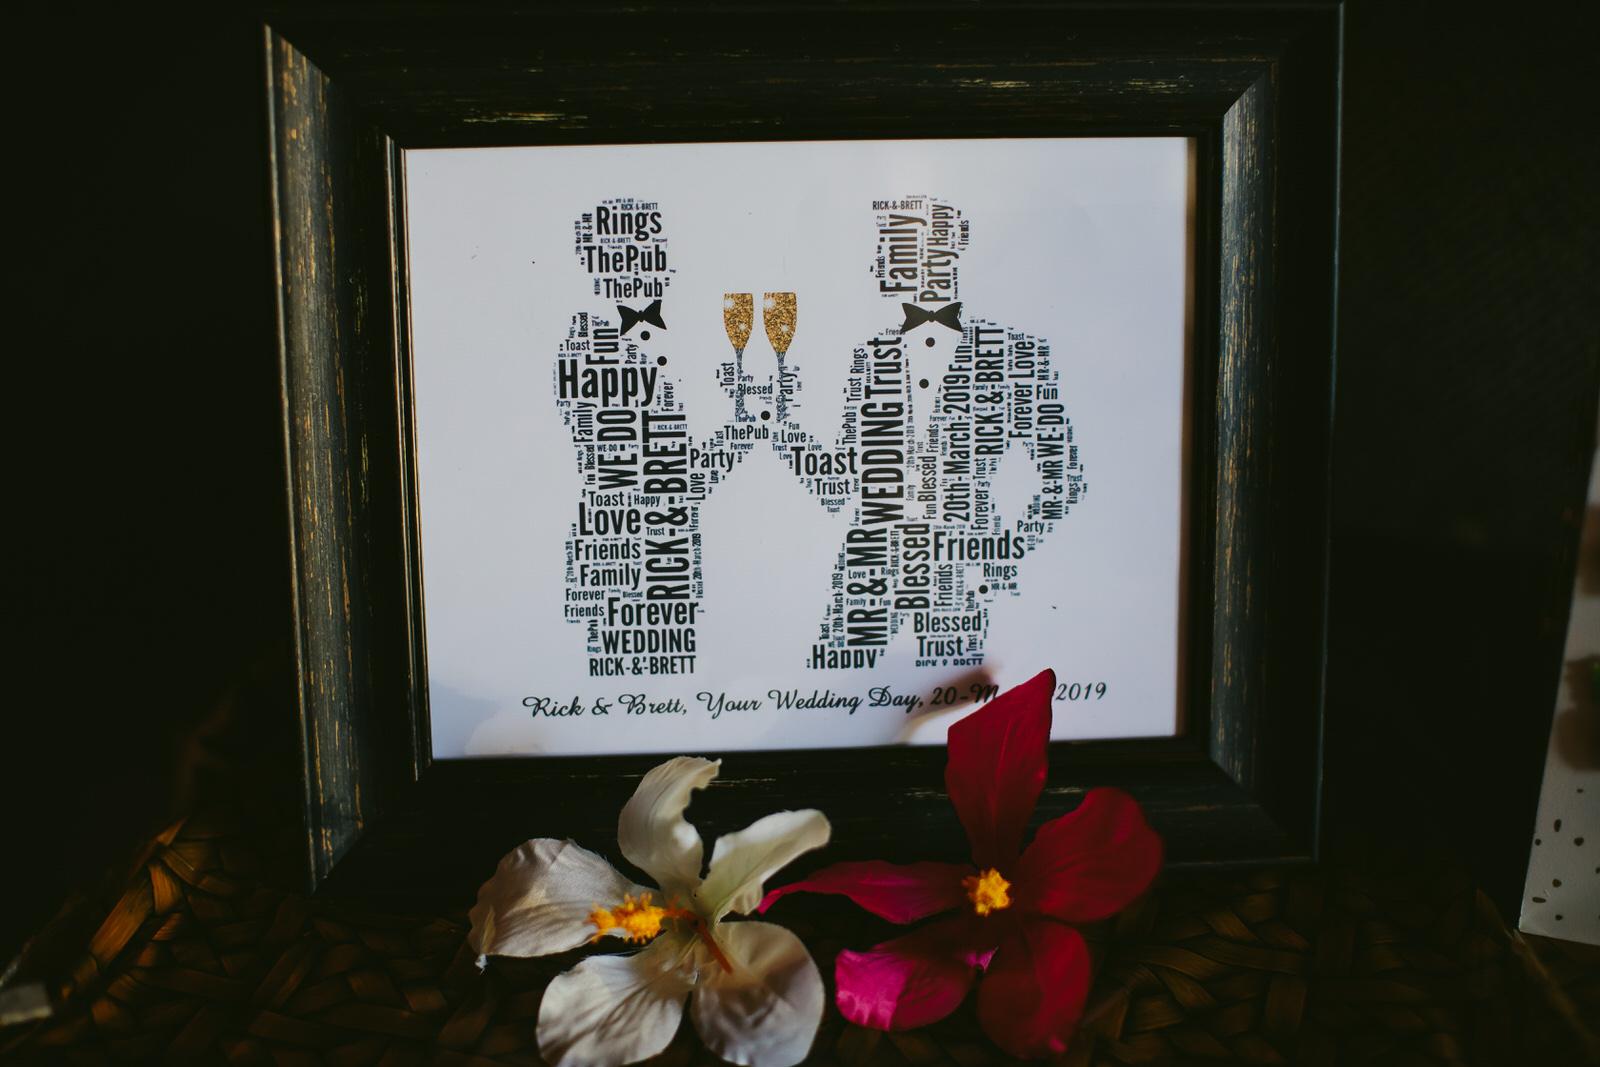 elopement-party-the-pub-wilton-manors-tiny-house-photo-florida-wedding-photographer-13.jpg